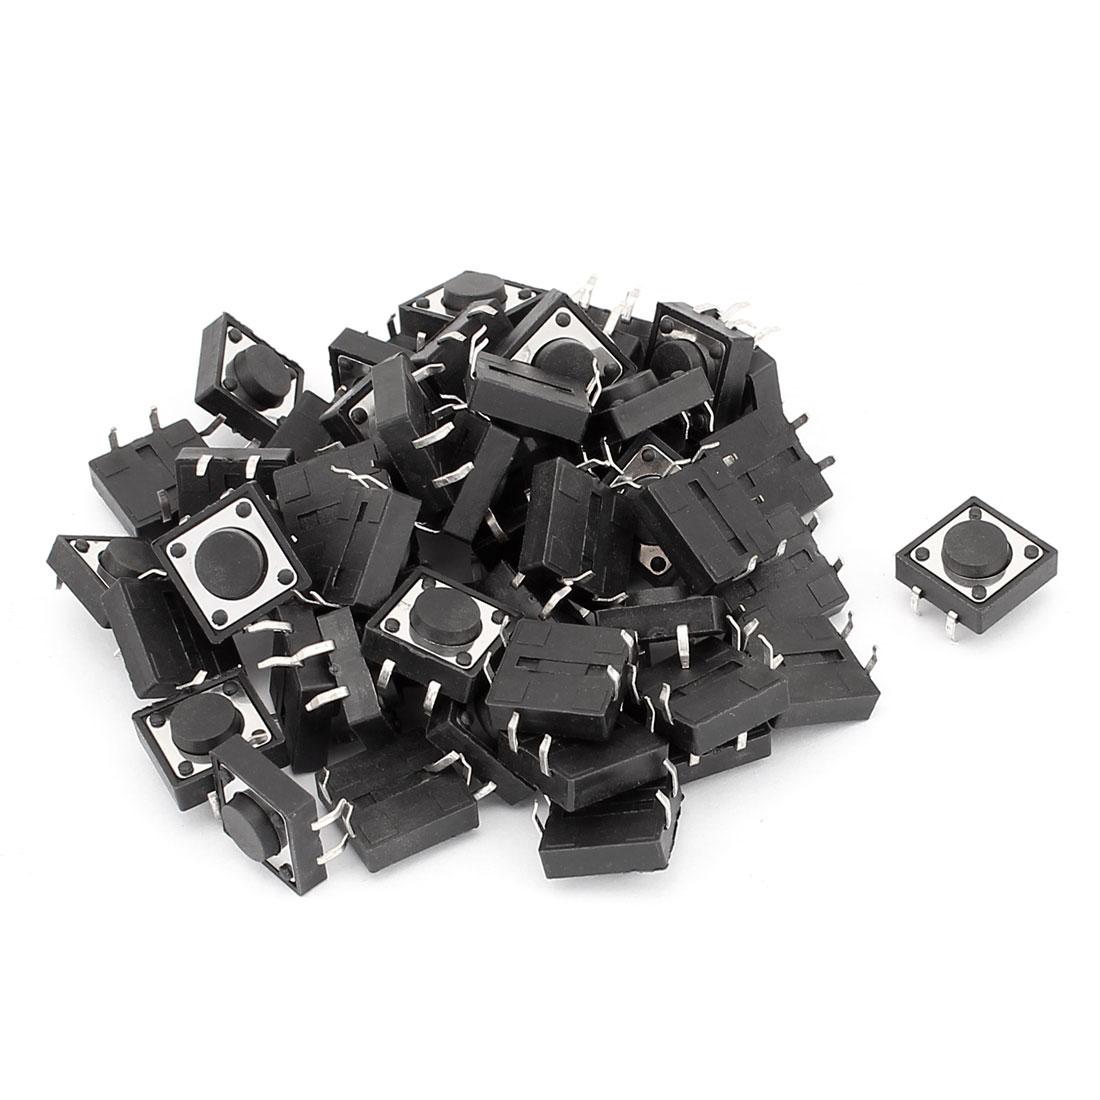 52 Pcs 4 Pins Round Push Button Momentary Tact Switch 12mmx12mmx5mm